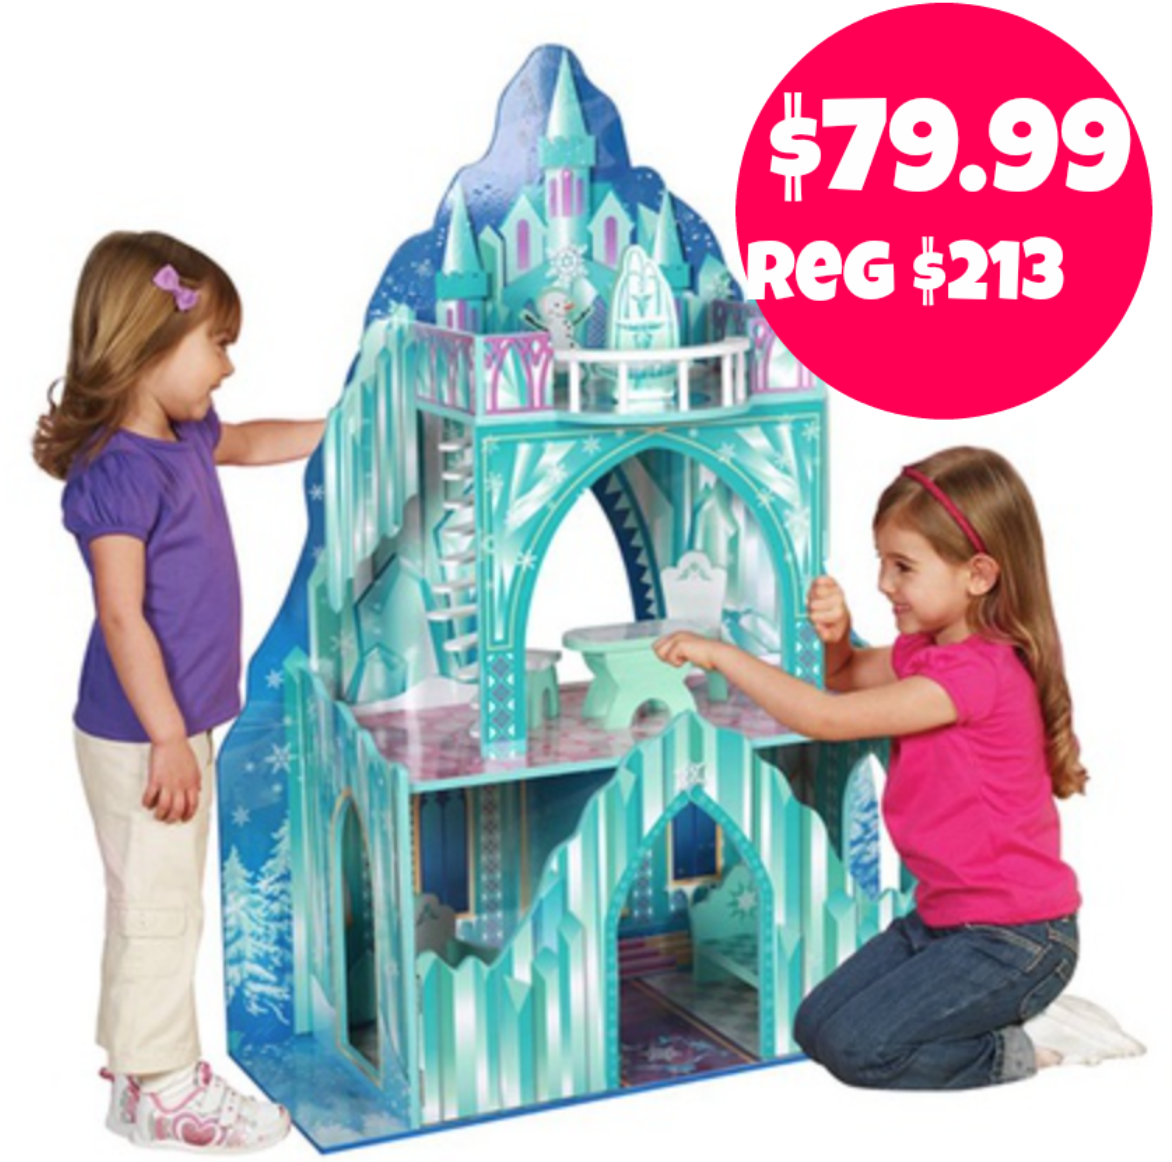 http://www.thebinderladies.com/2014/12/groupon-frozen-inspired-ice-mansion.html